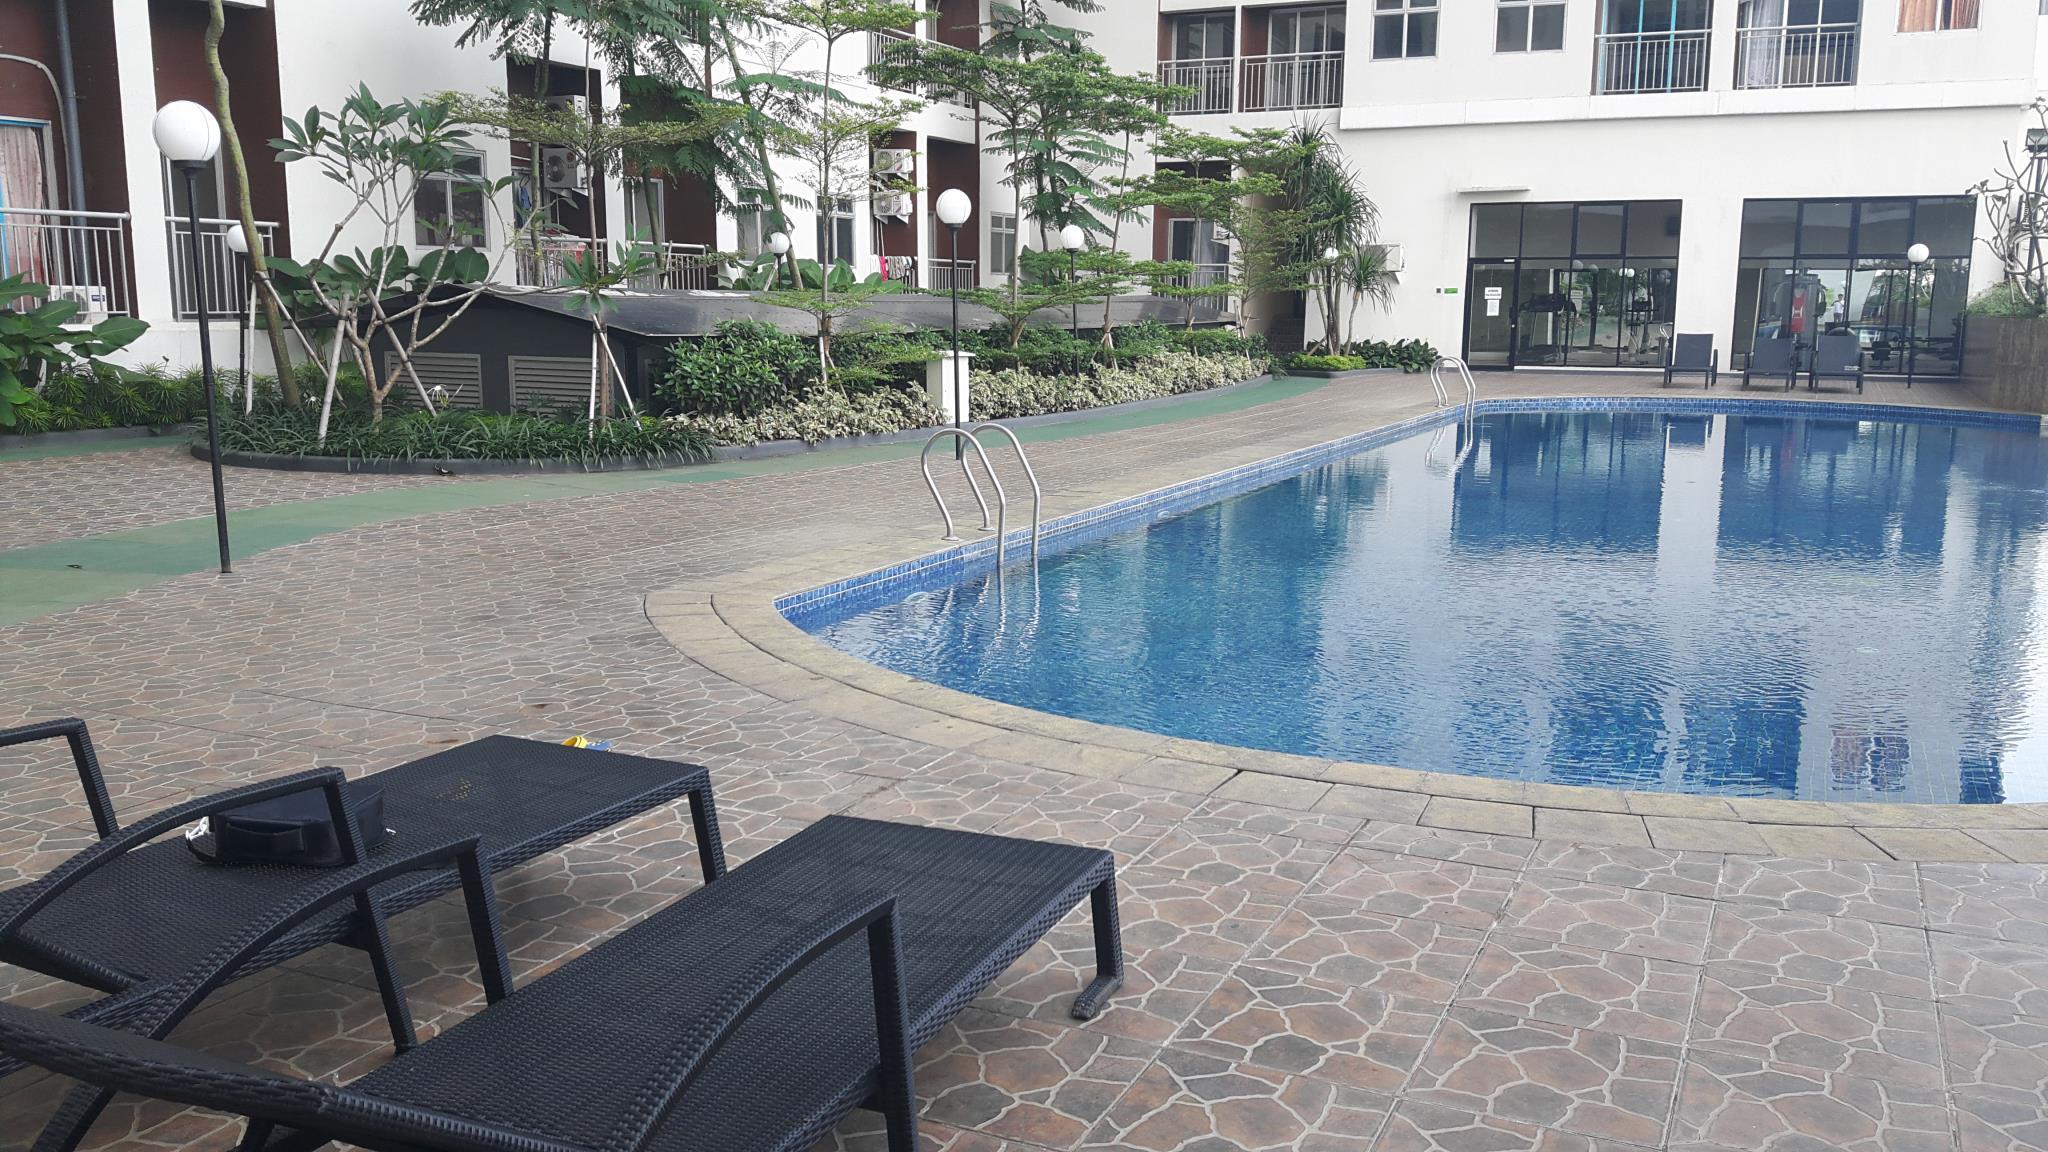 Hotel Apartemen Serpong Greenview - Queen Room - Jl. Lengkong Gudang Timur, Lengkong Gudang Timur, Serpong, Tangerang Selatan, Banten - Tangerang